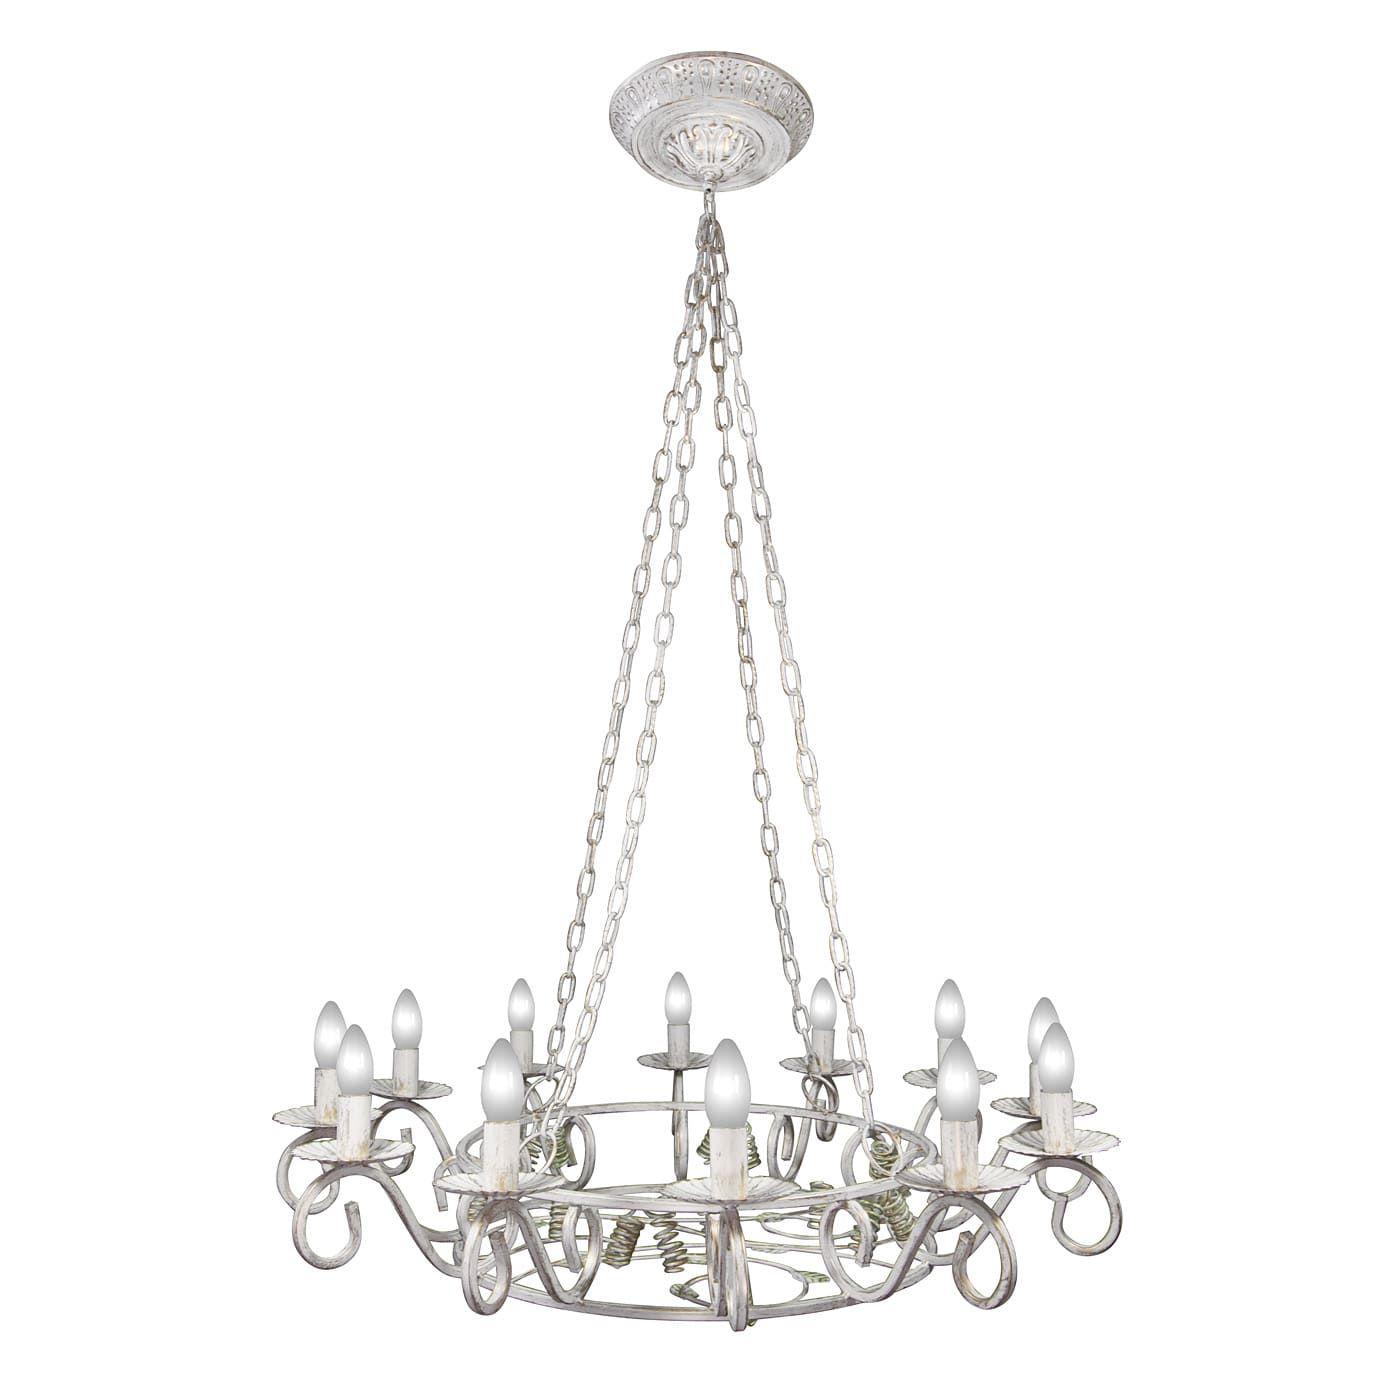 PETRASVET / Pendant chandelier S3020-12, 12xE14 max. 60W